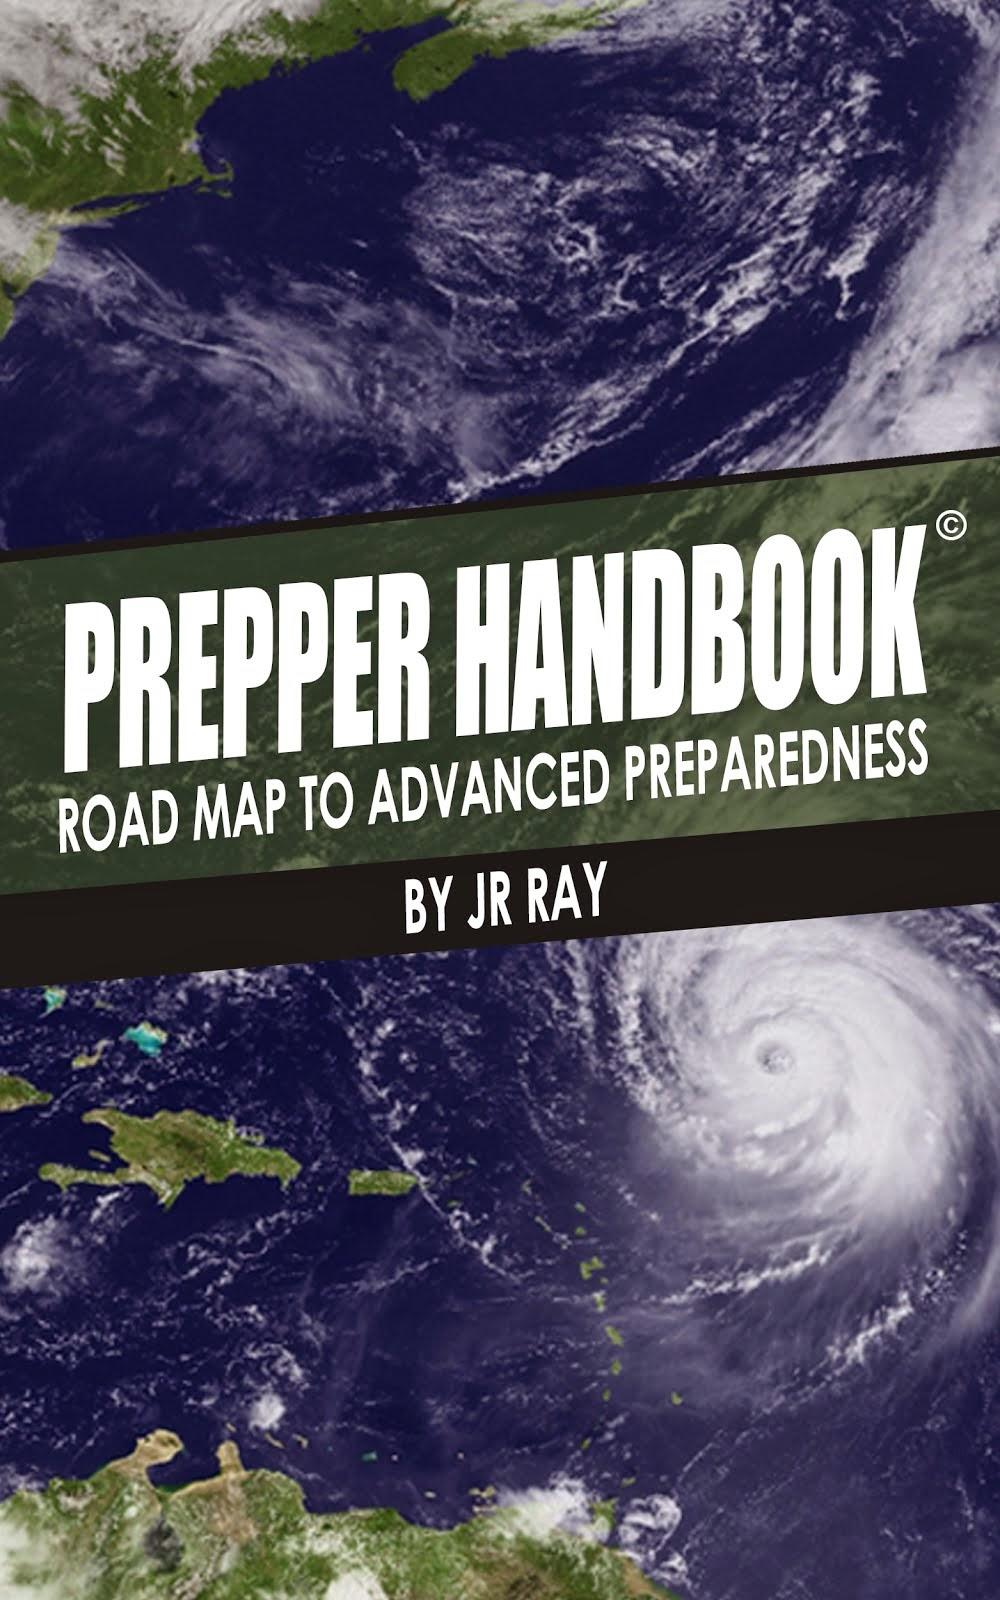 Prepper Handbook